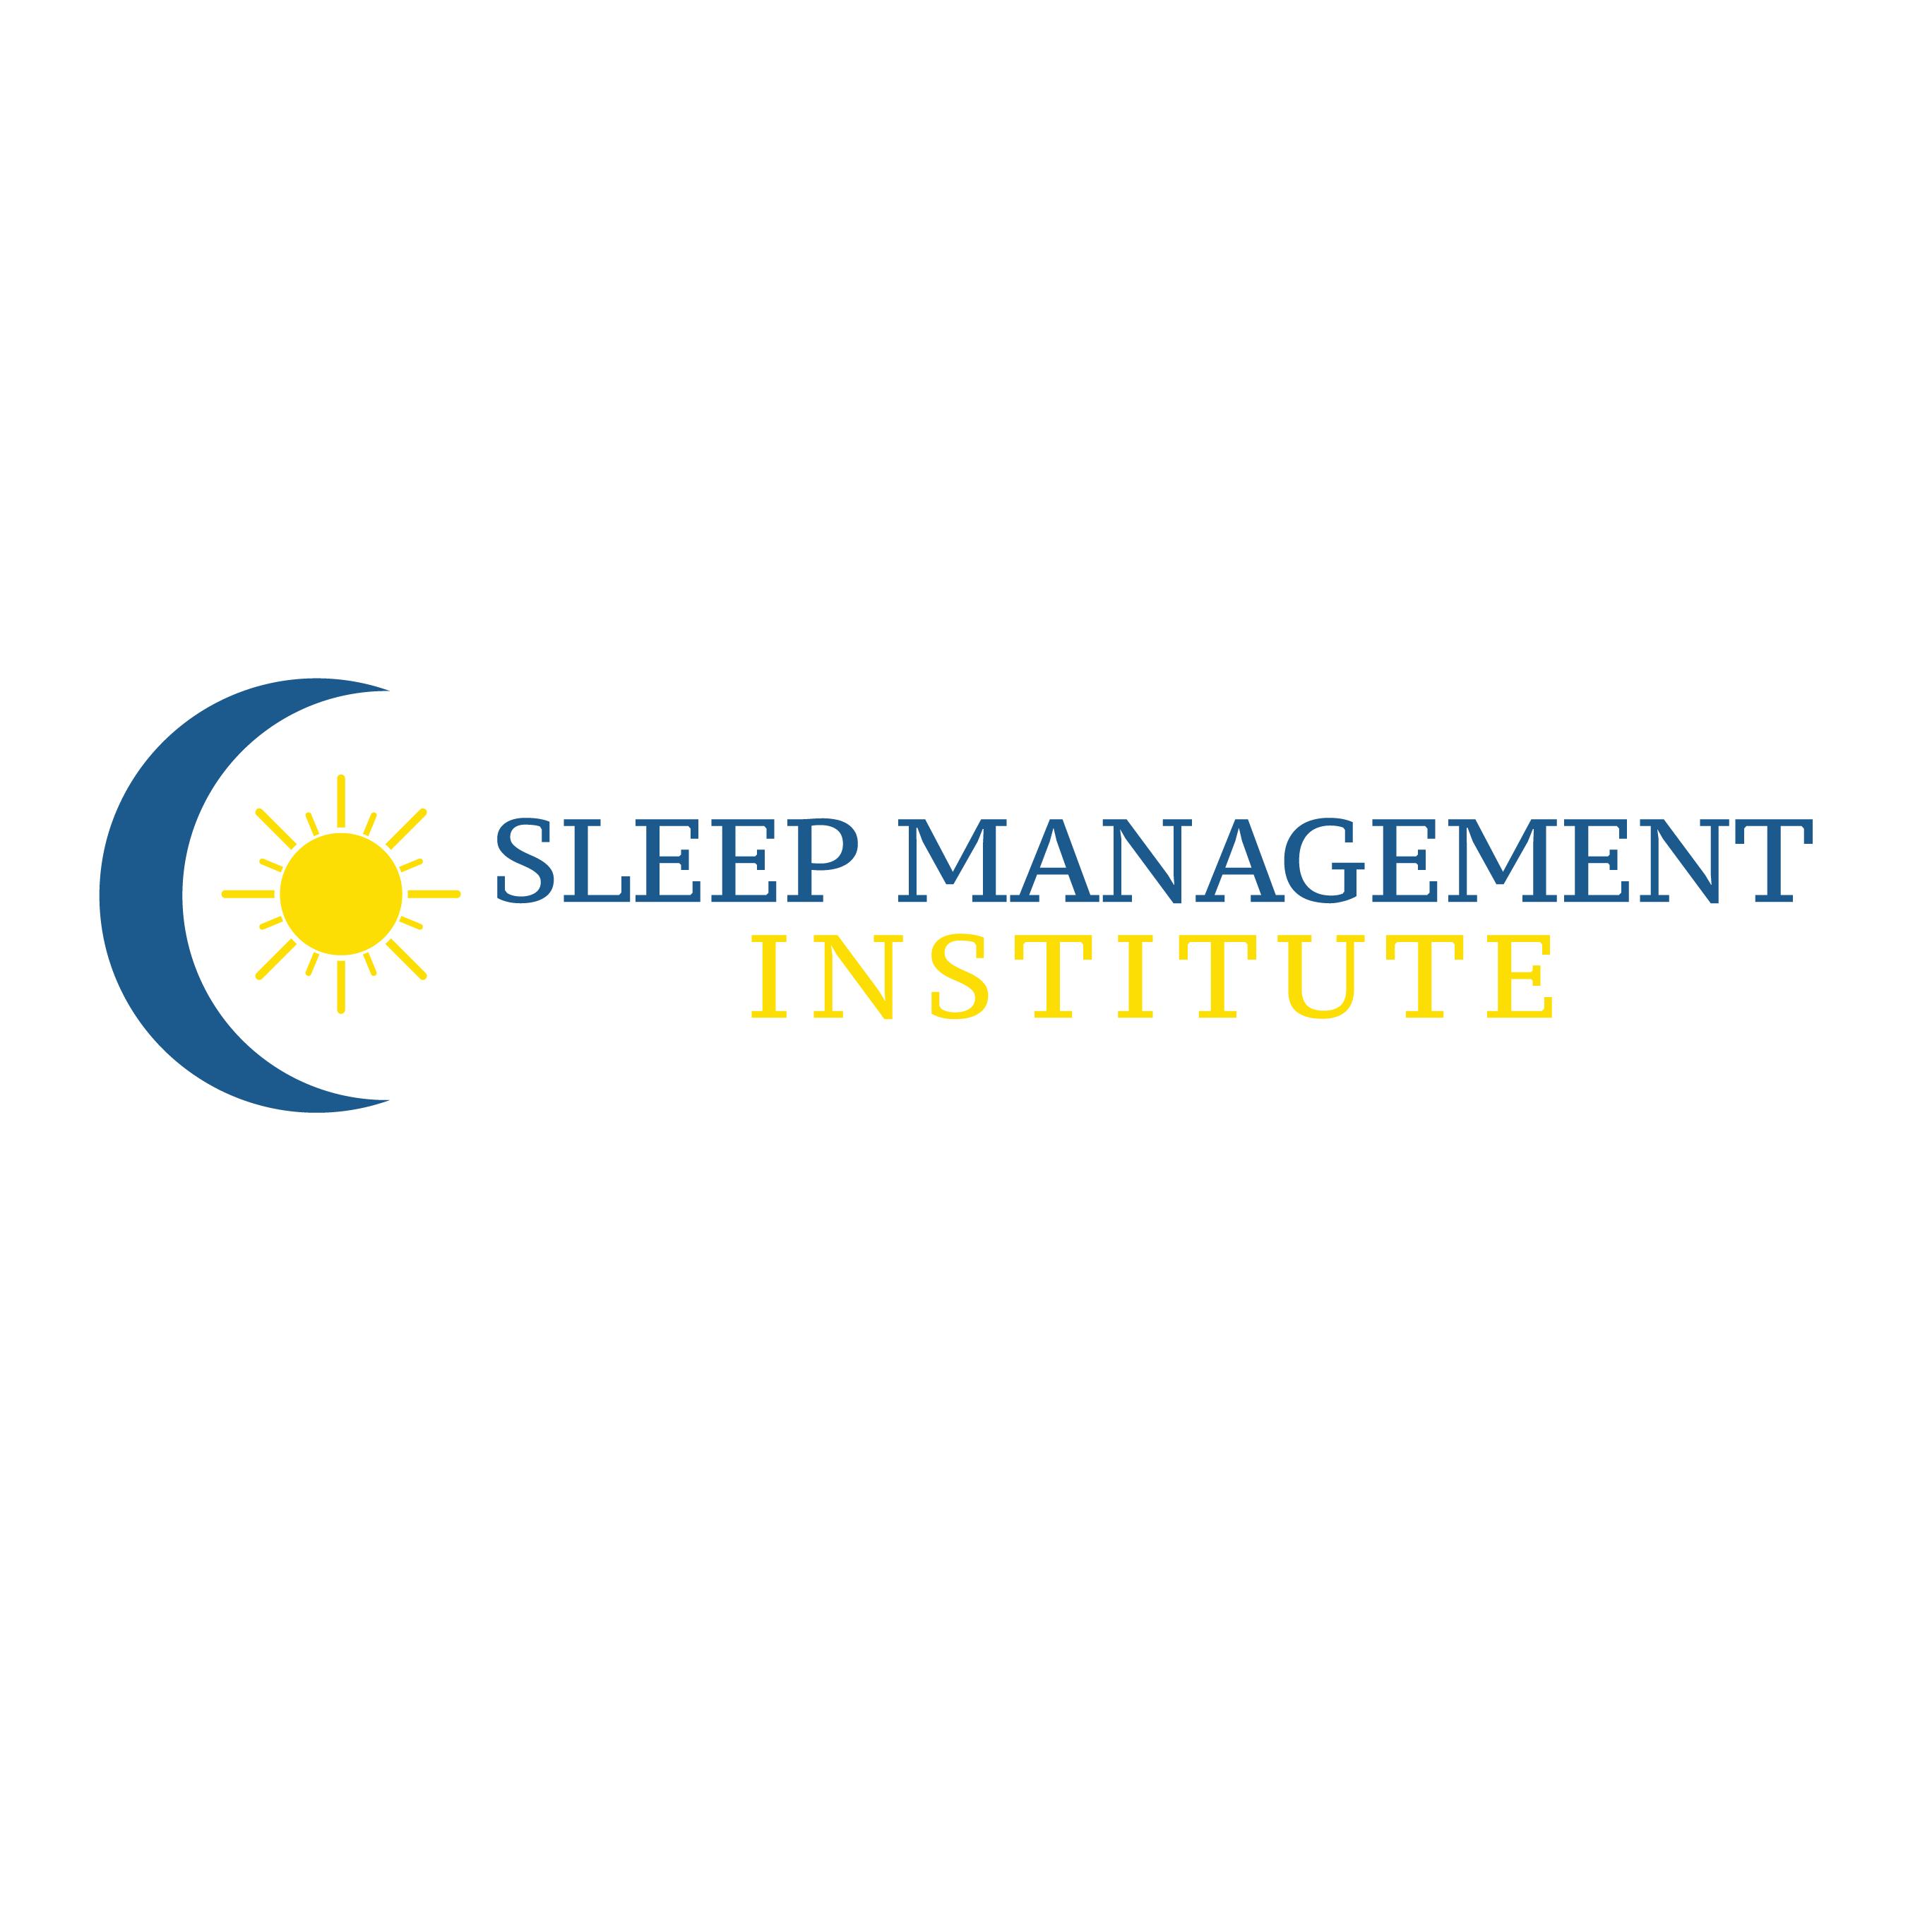 Sleep Management Institute - Cincinnati, OH 45245 - (513)721-7533 | ShowMeLocal.com